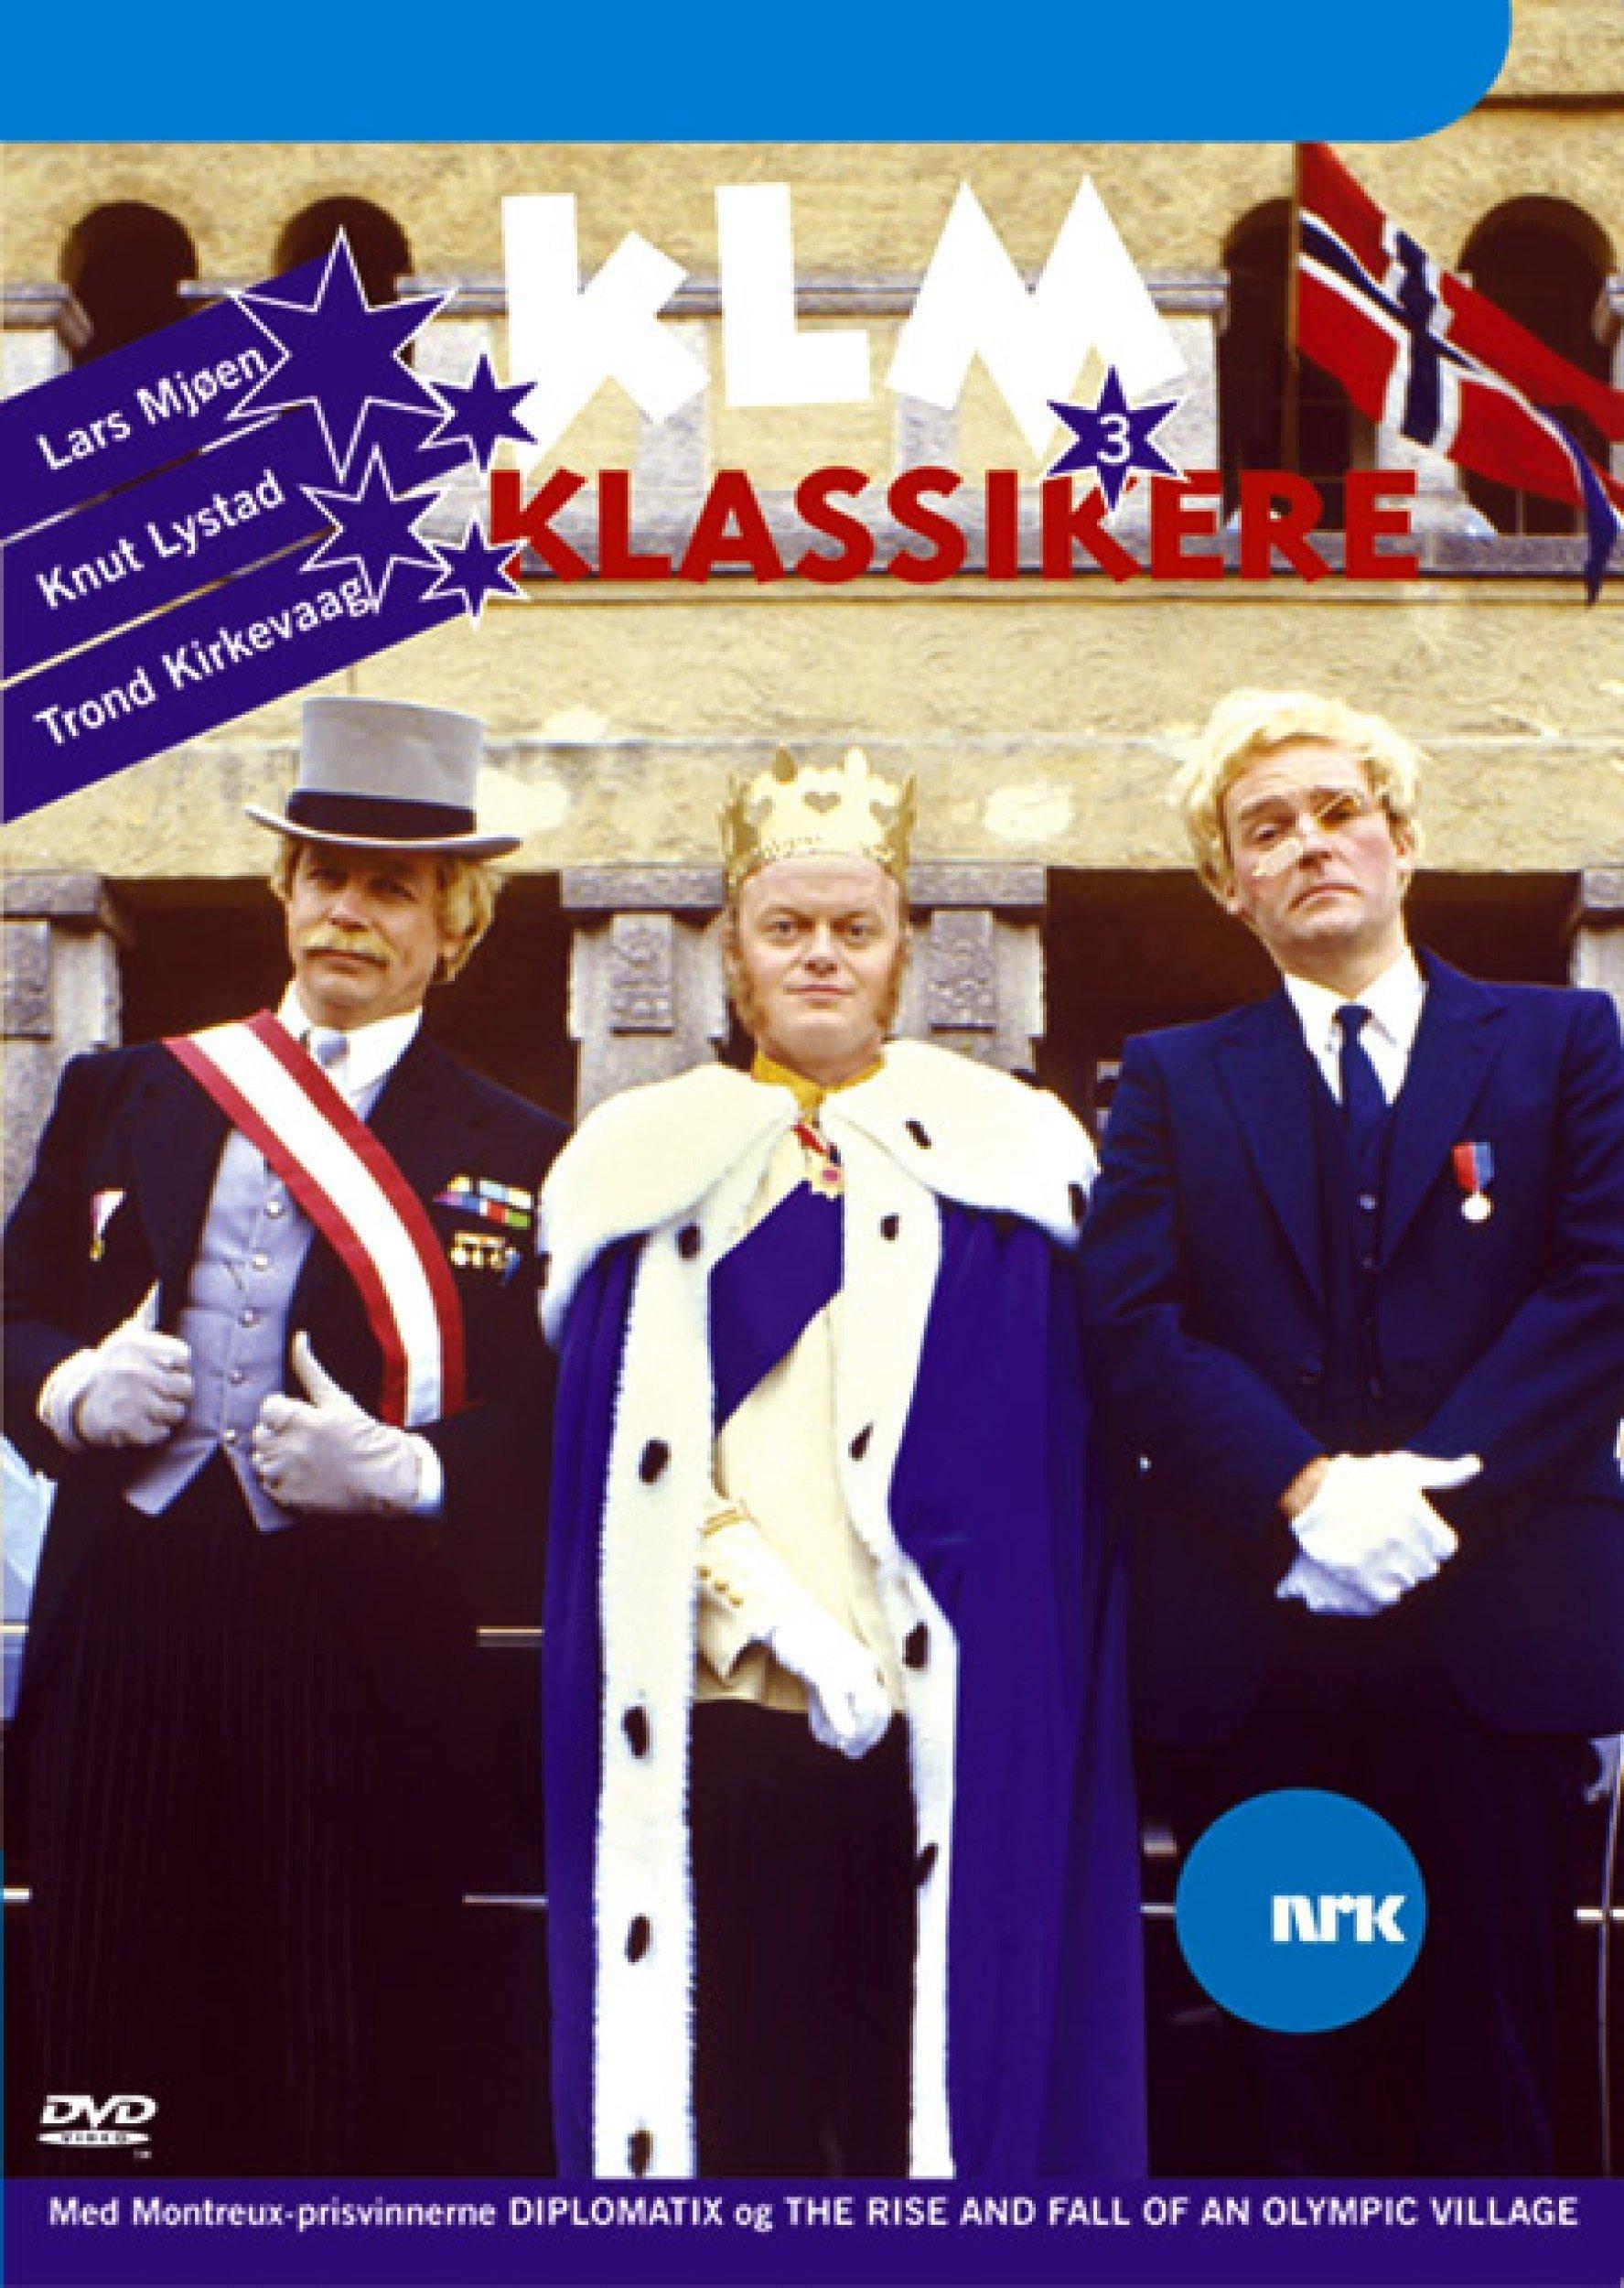 KLM Classics 3